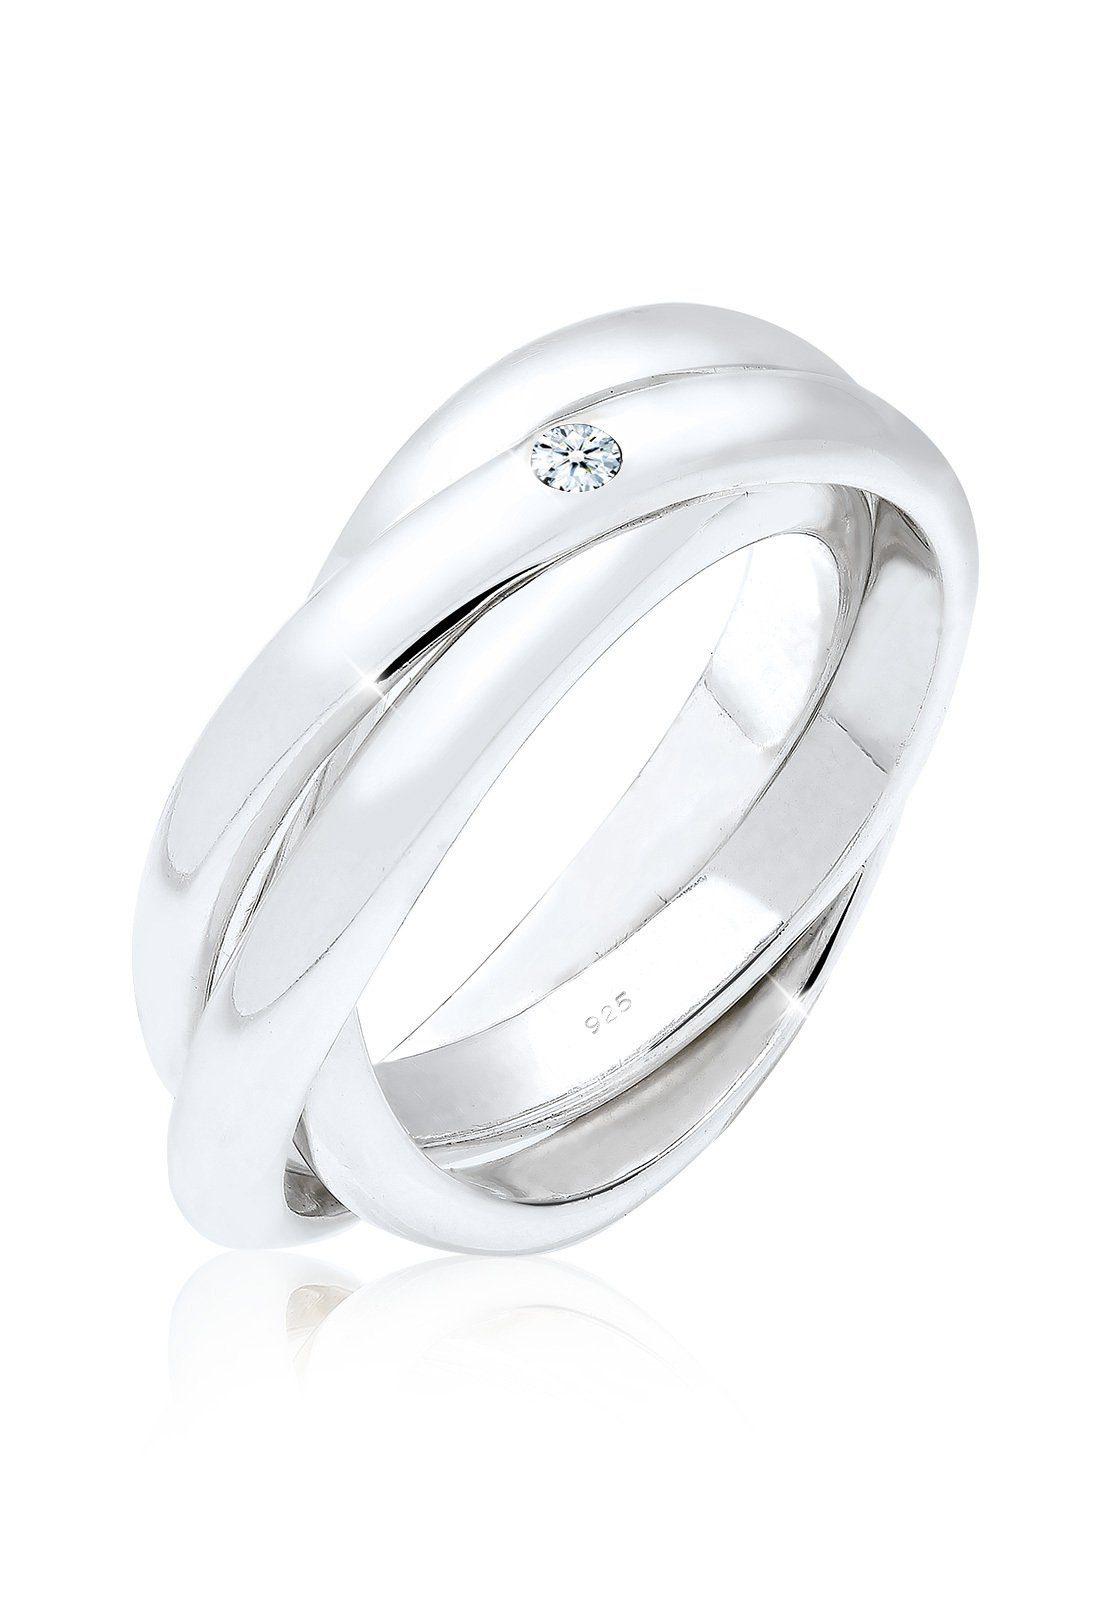 Elli Diamantring Verlobungsring Diamant 003 ct 925 Silber | Schmuck > Ringe > Diamantringe | Weiß | Elli